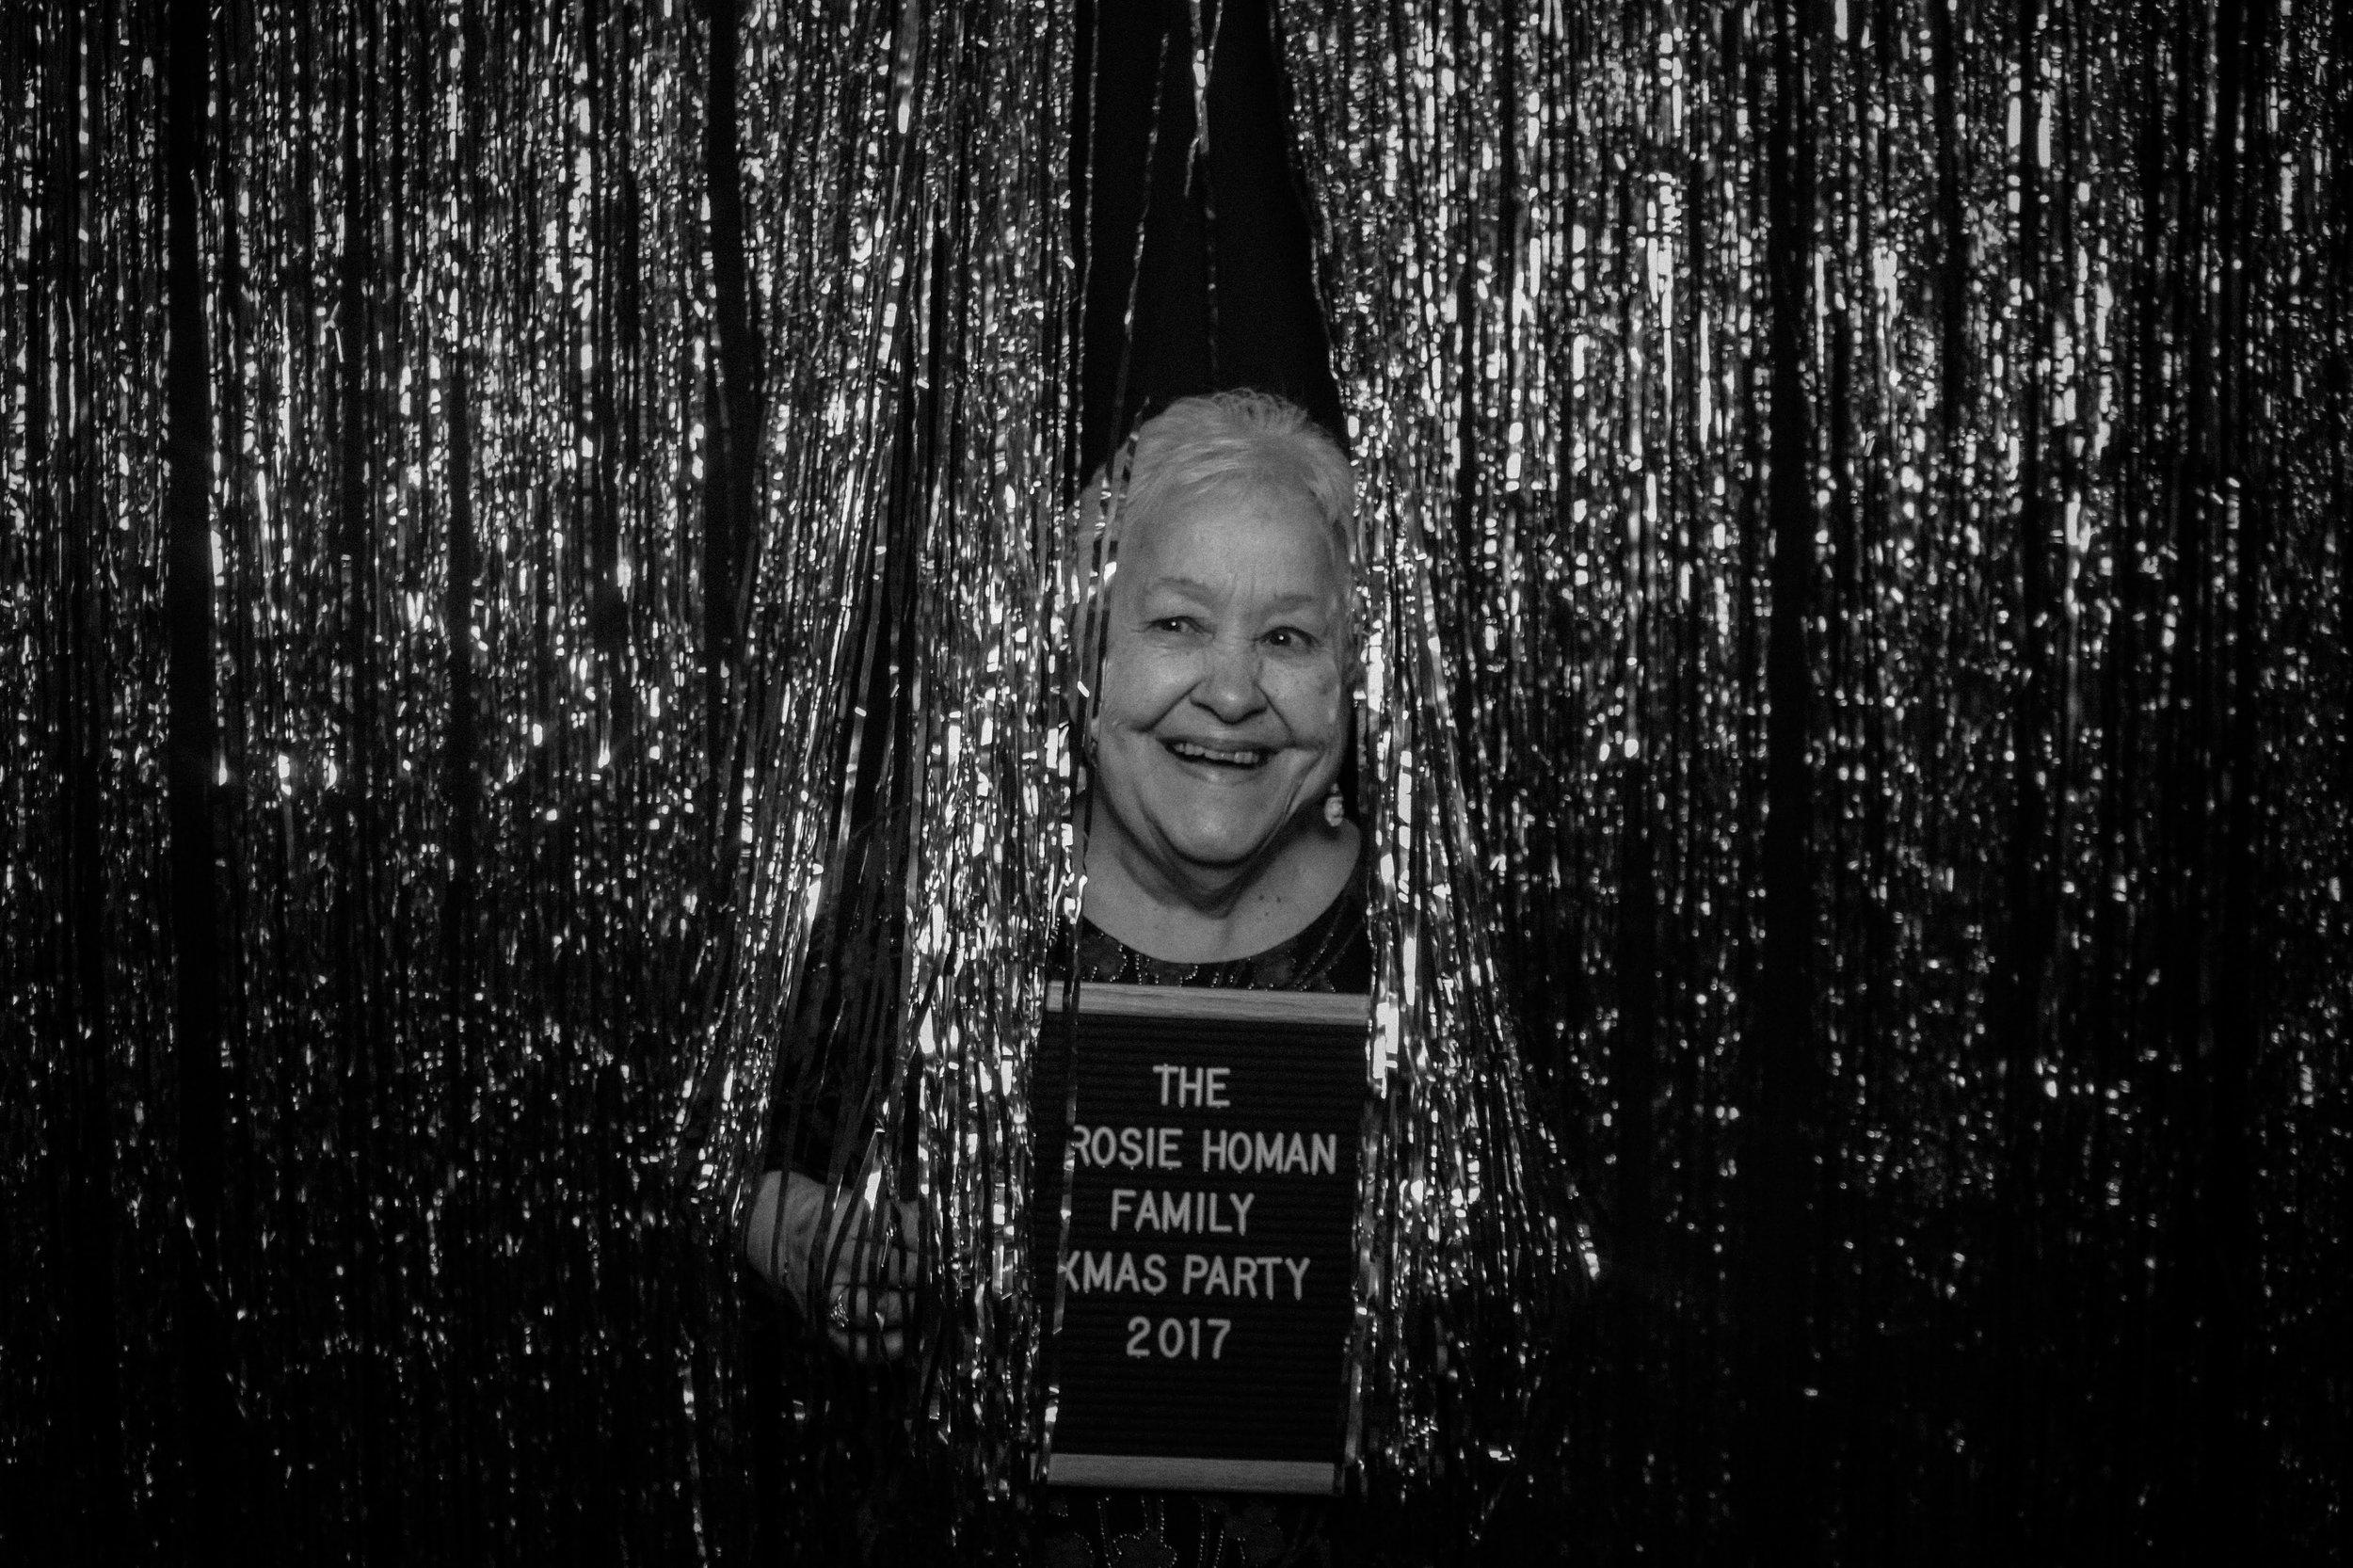 Rosie Homan Xmas Party 2017-056.jpg